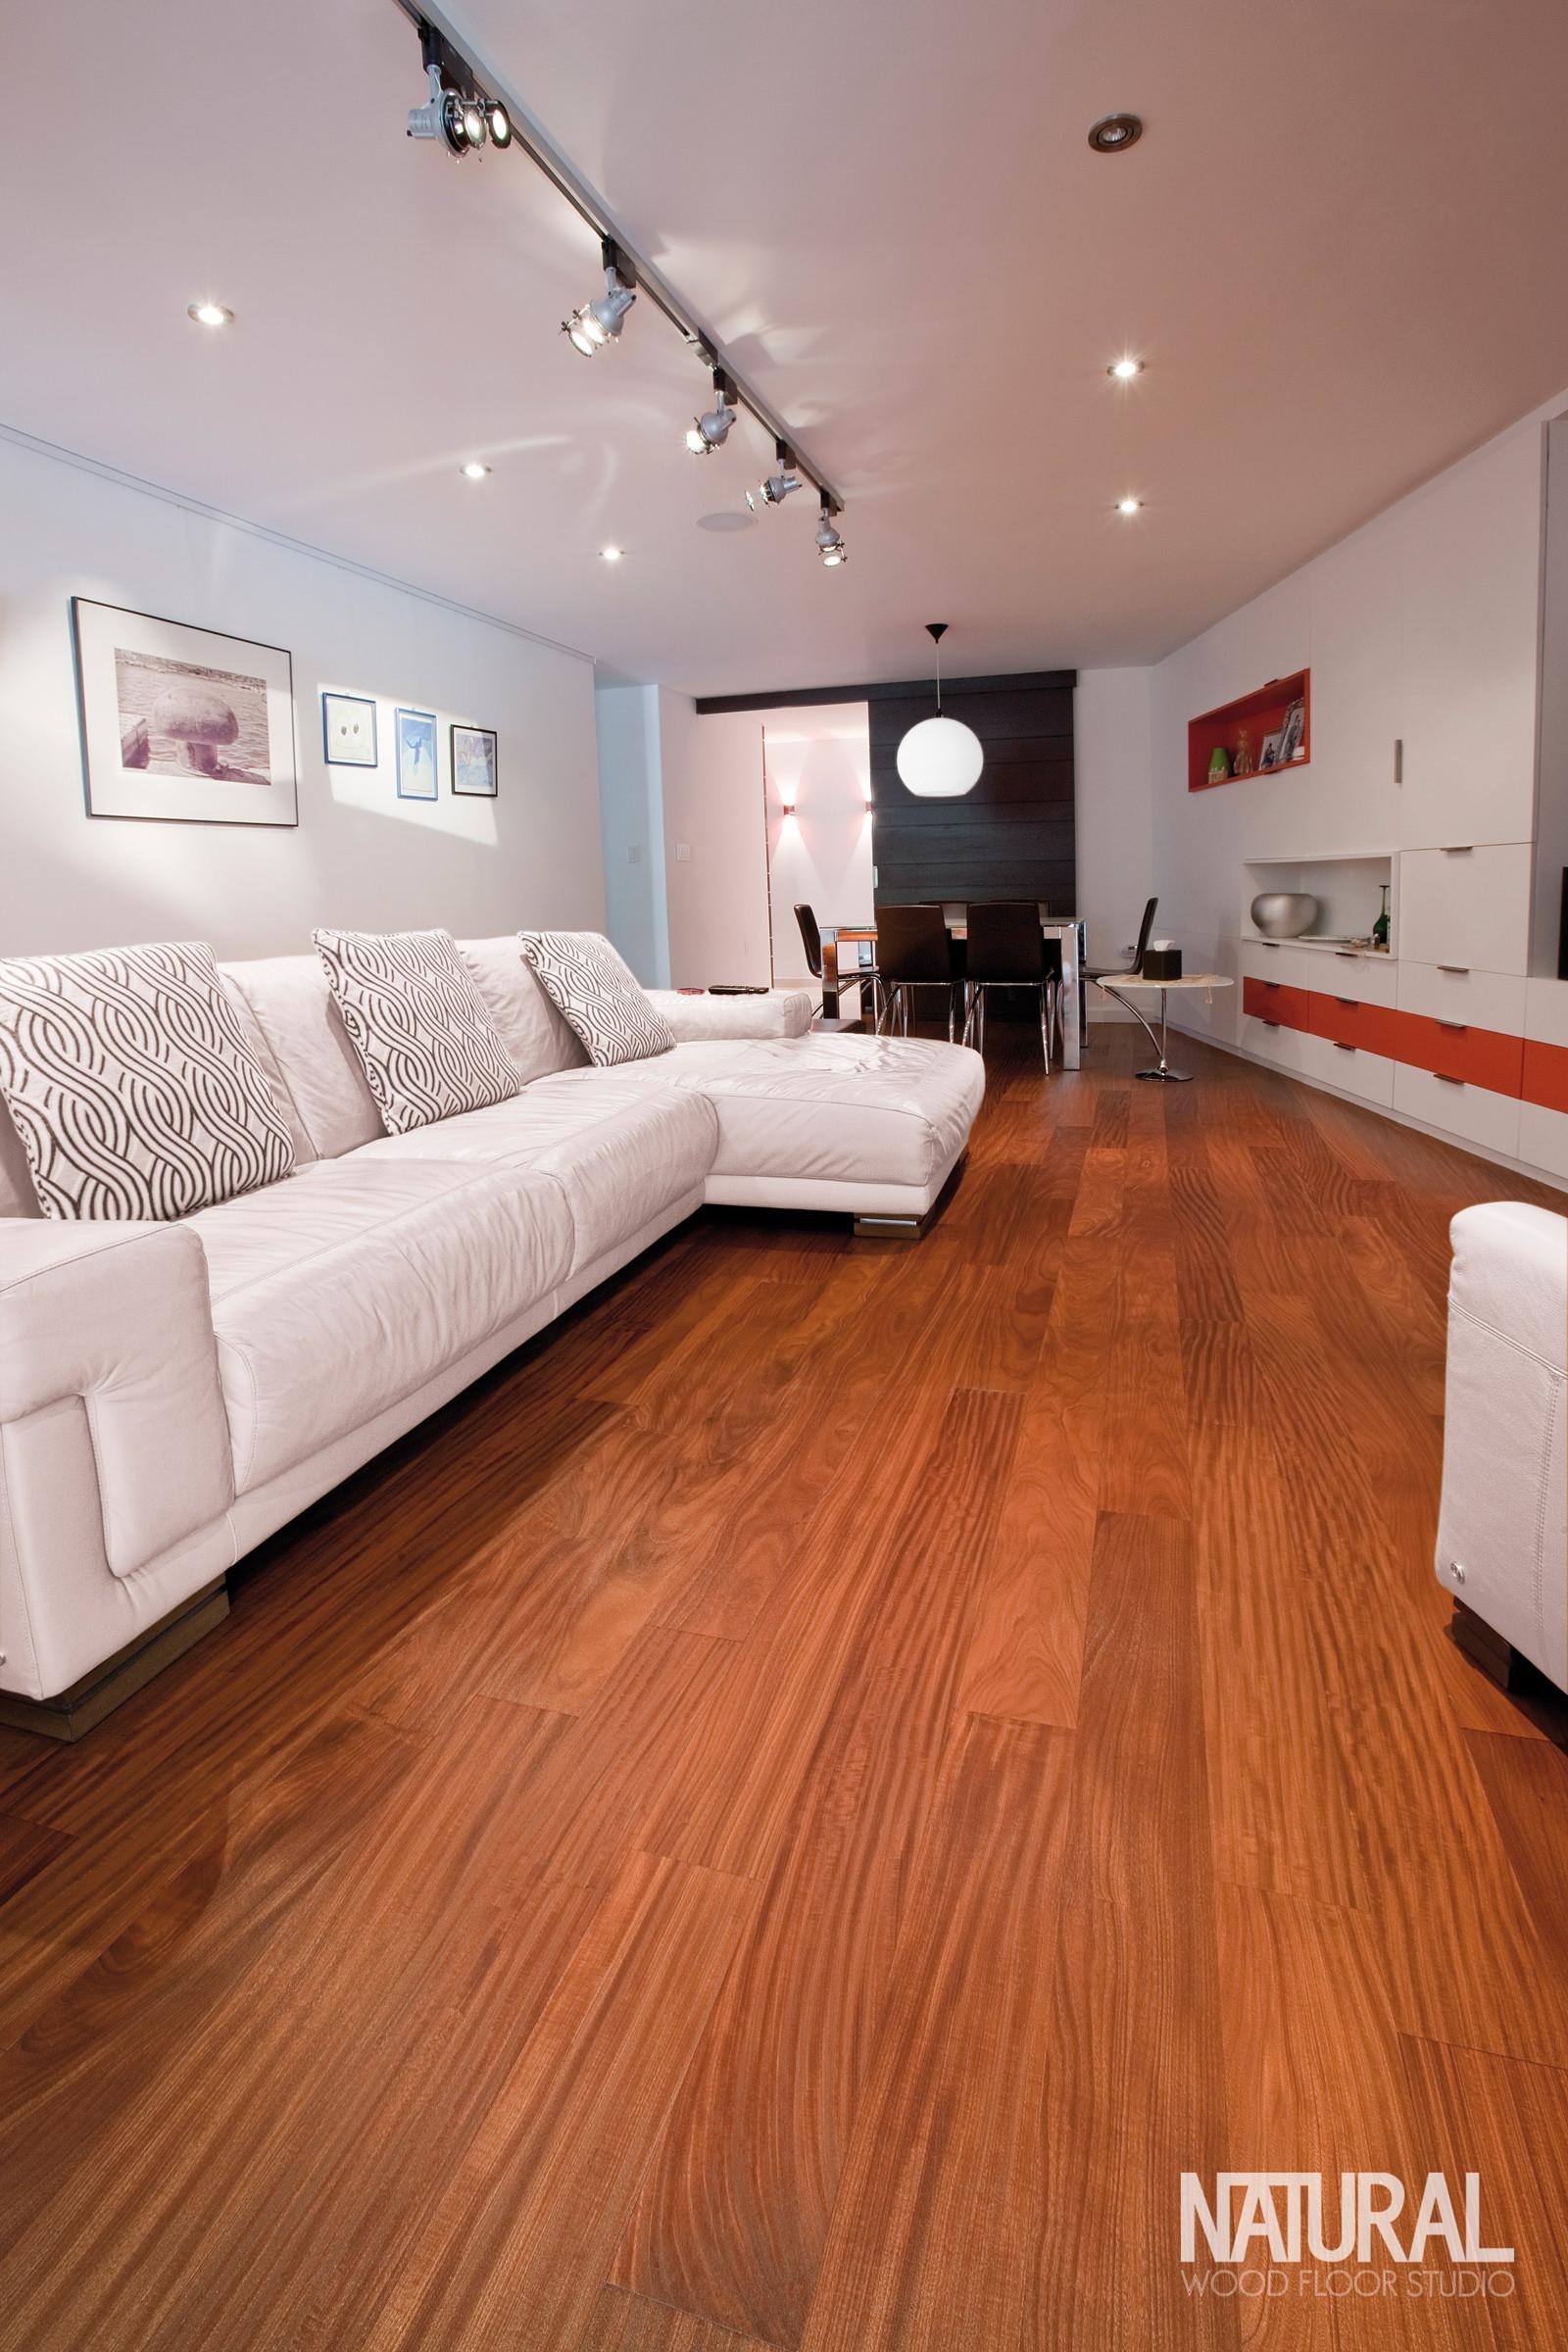 hardwood floor cleaning companies of natural wood floor studio the fine art of wood floors with design